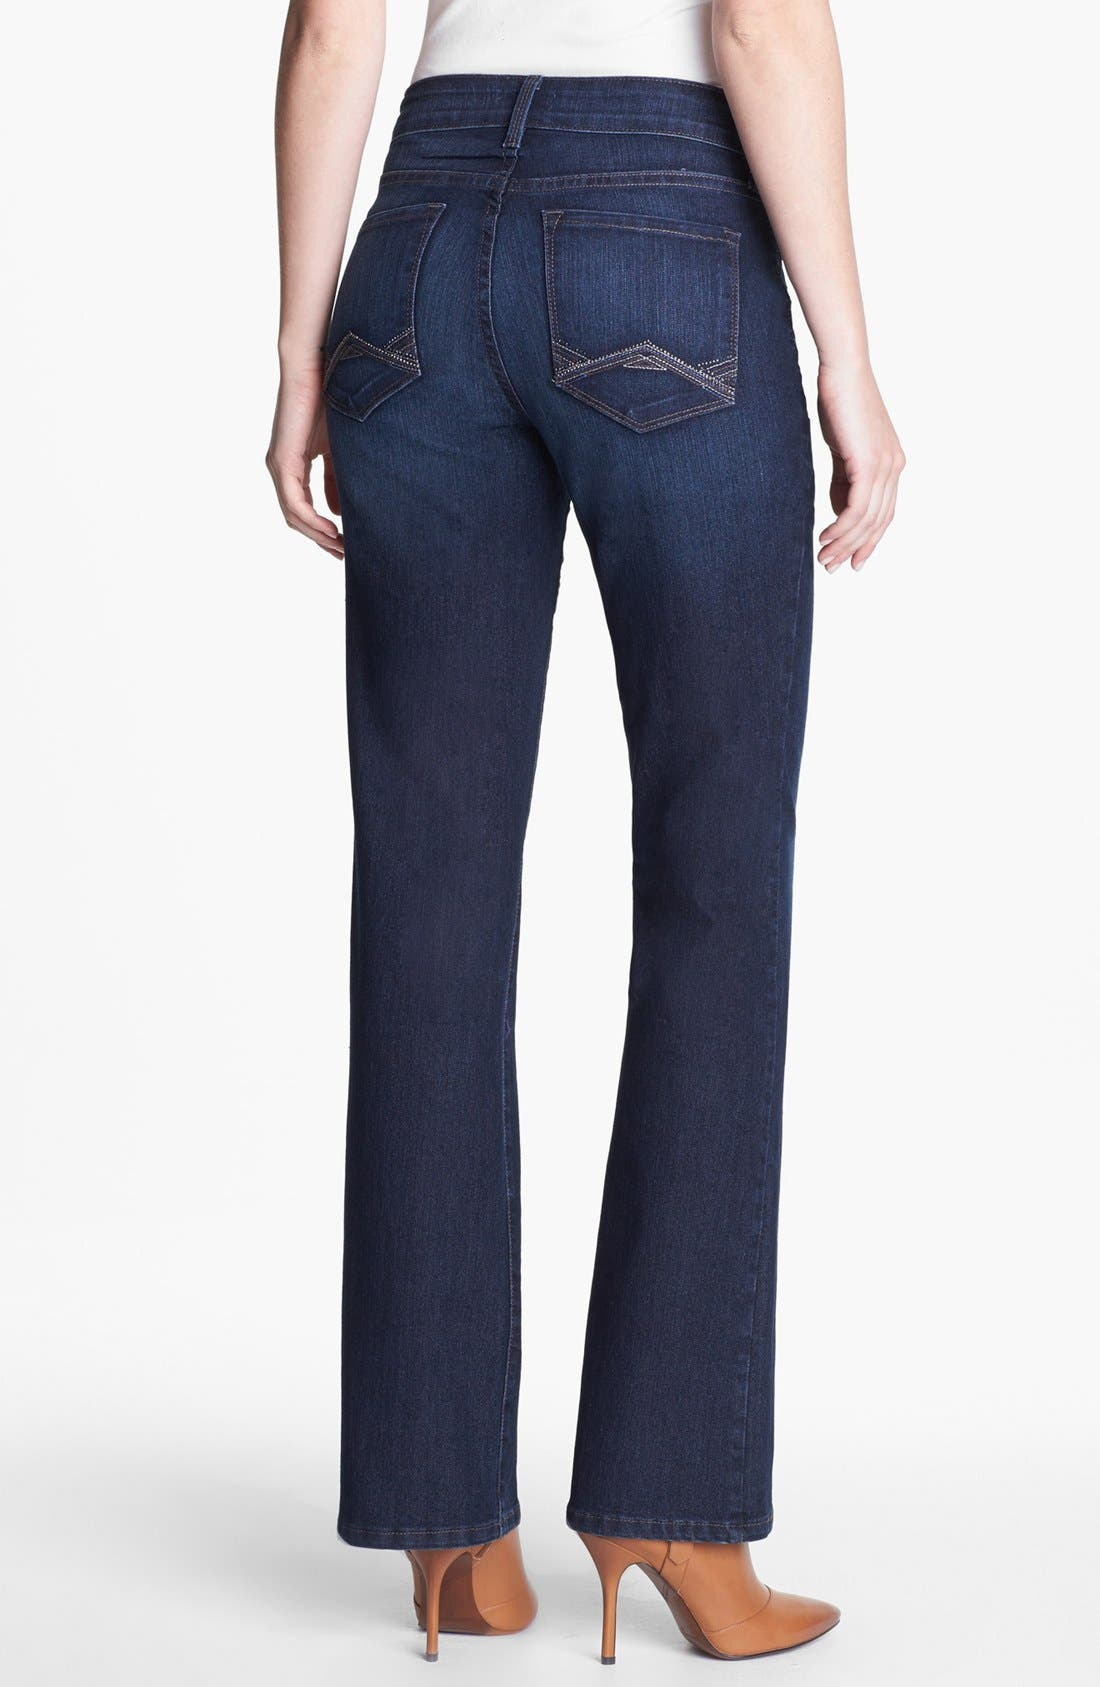 Alternate Image 2  - NYDJ 'Barbara' Embellished Stretch Bootcut Jeans (Online Only)